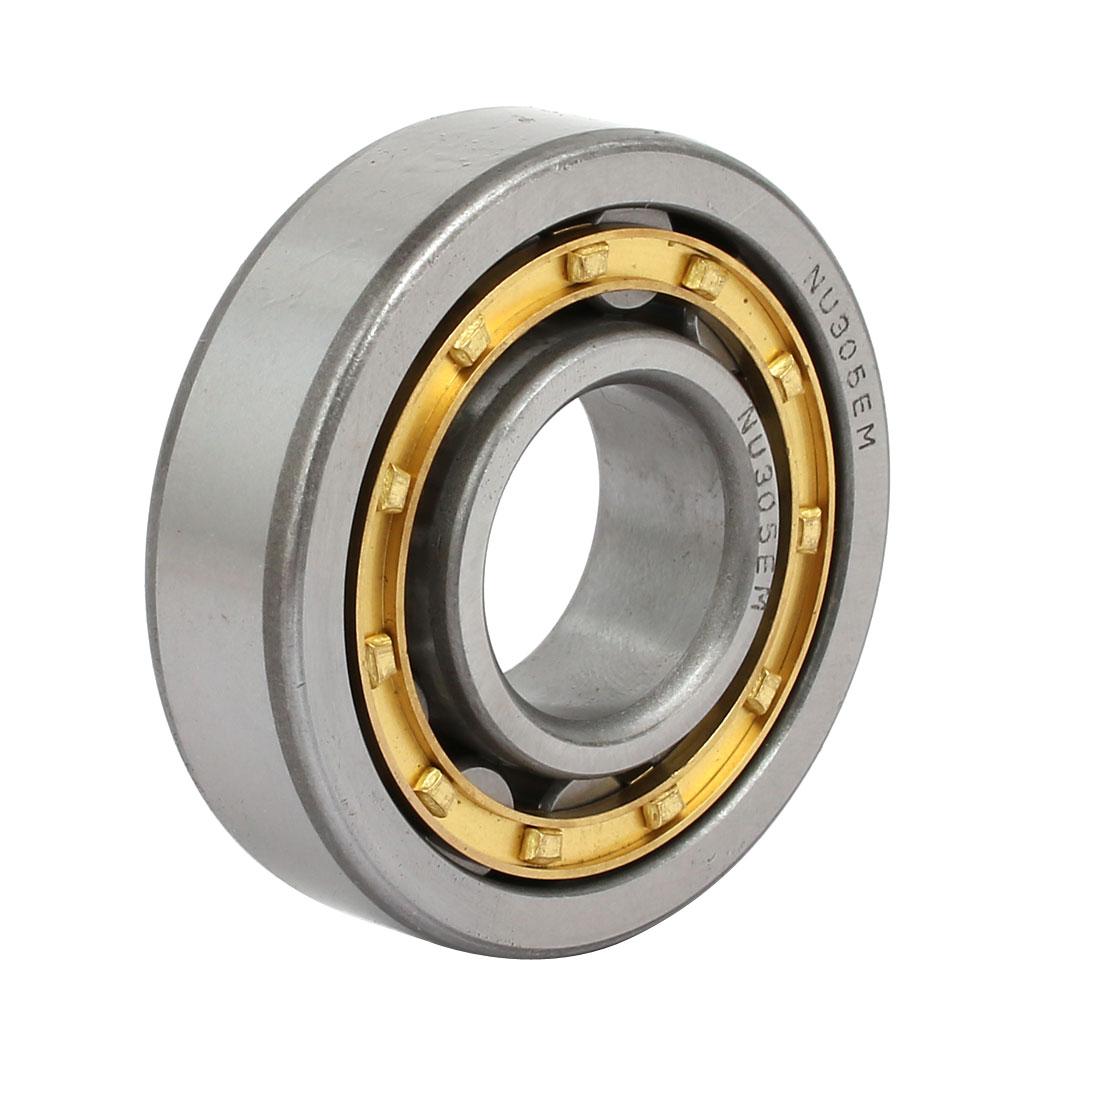 NU305EM 62mmx25mmx17mm Single Row Cylindrical Roller Bearing